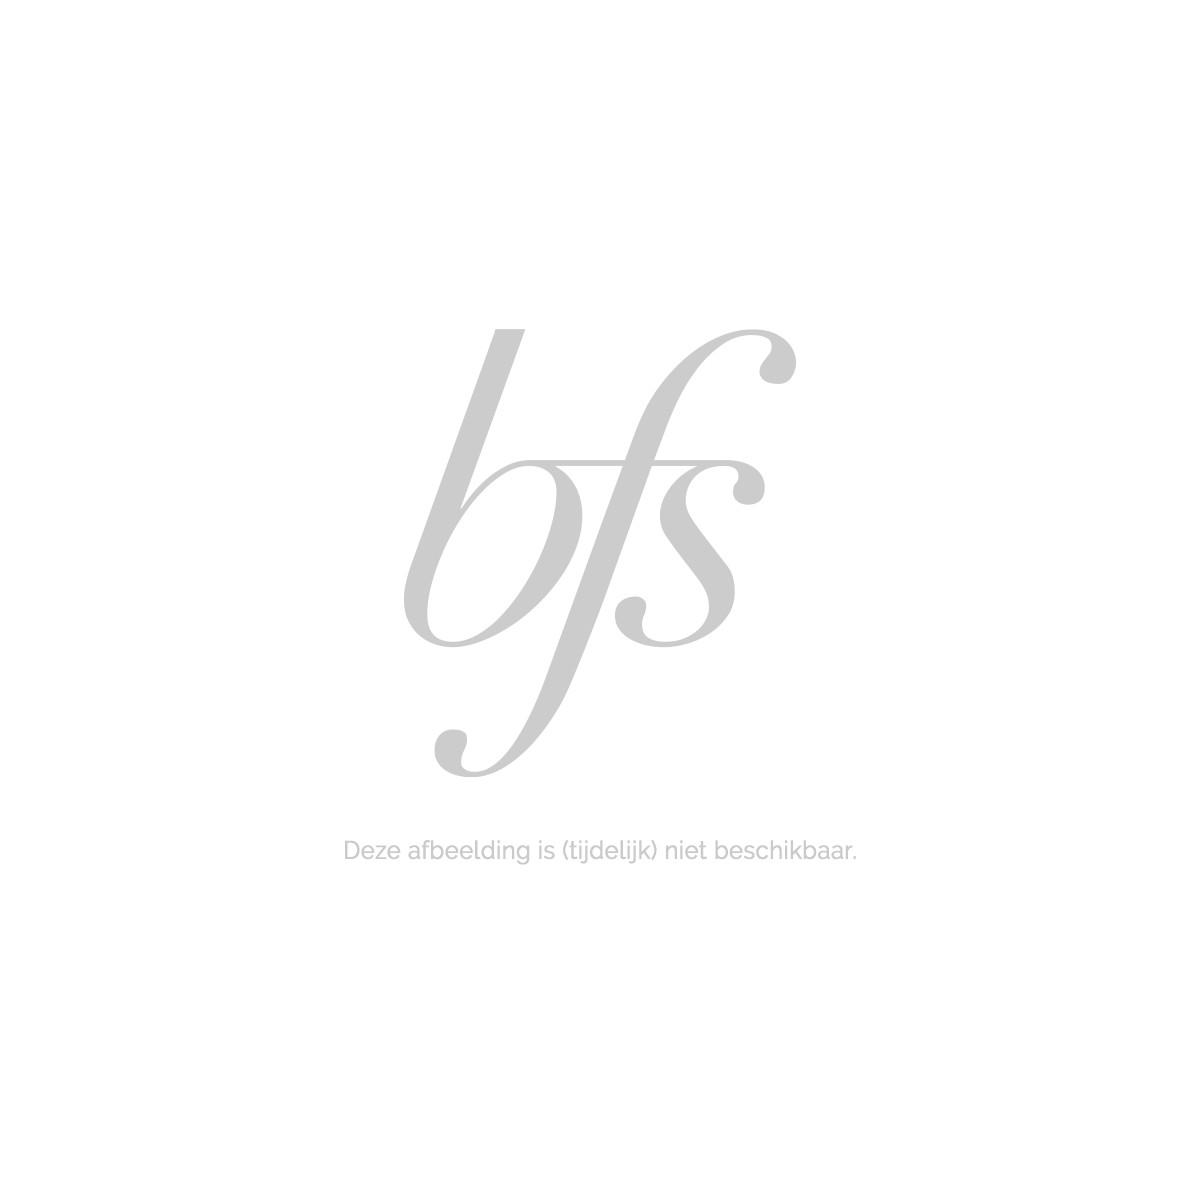 Afbeelding van Ahava Botanics Bodylotion Hibiscus & Fig, 400 ml